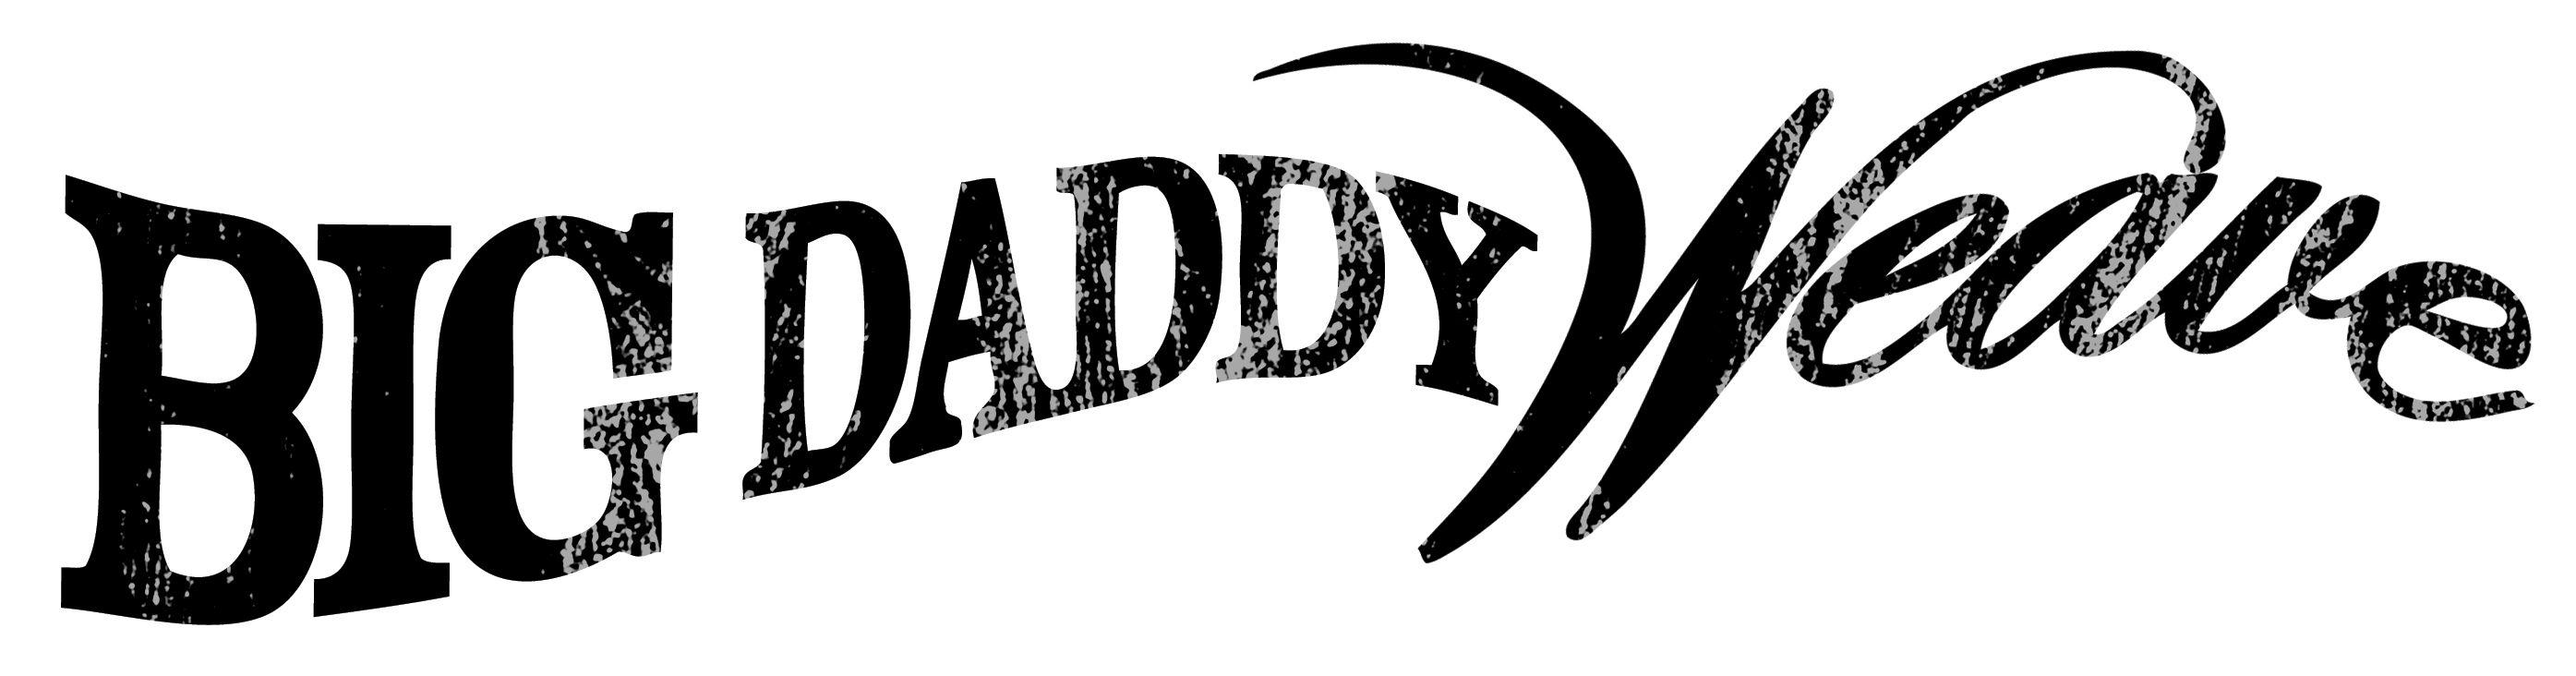 Big Daddy Weave Logo Google Search Logo Google Big